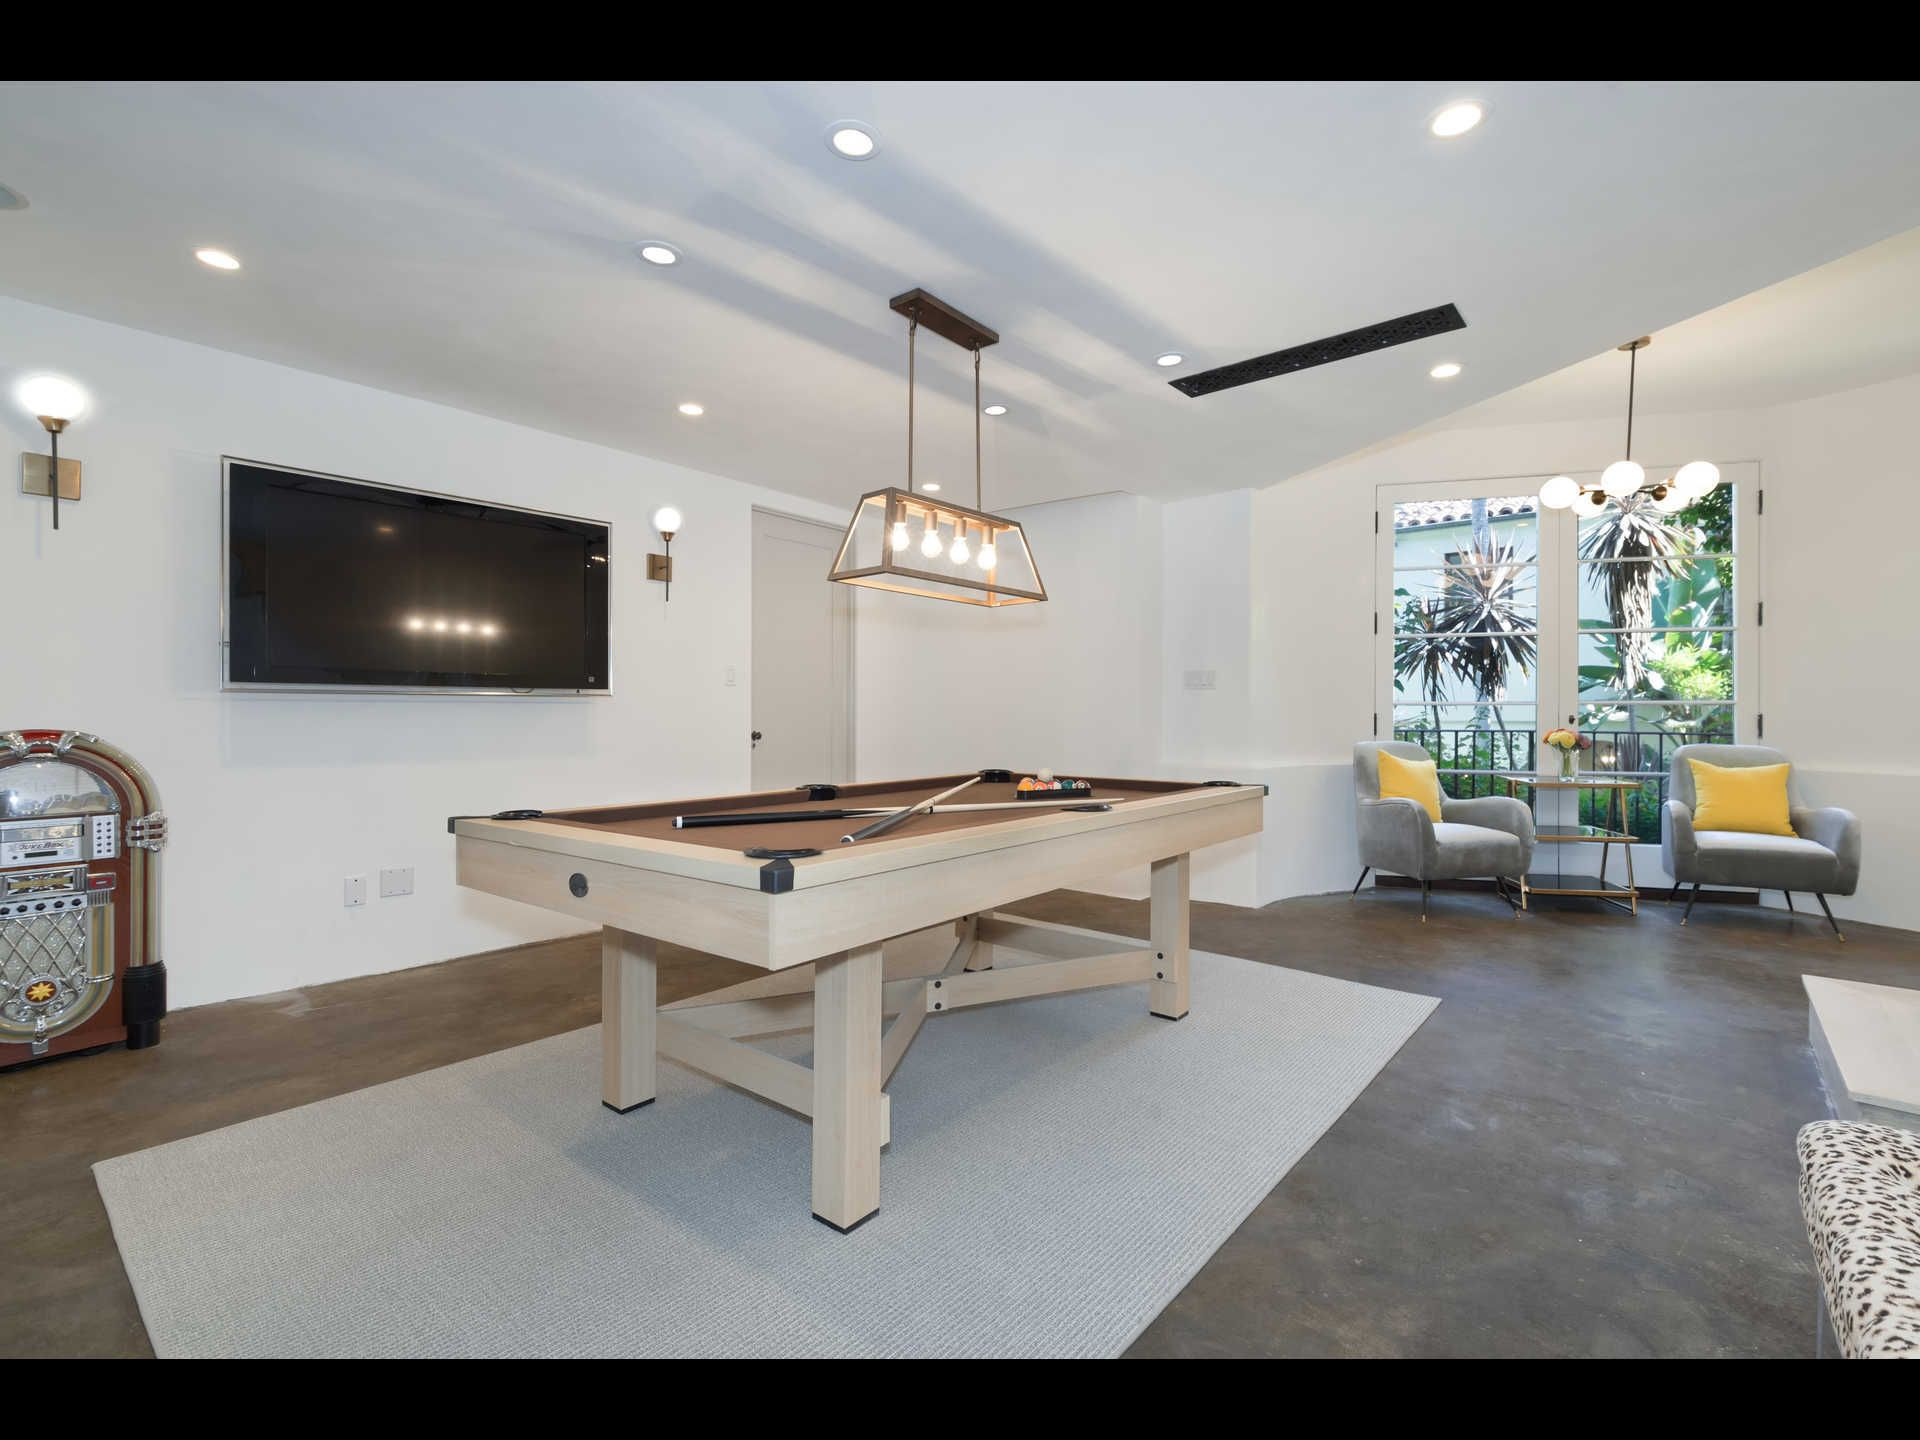 1448 Queens Way, Los Angeles Property Listing: MLS® #c11109 | Fresh ...